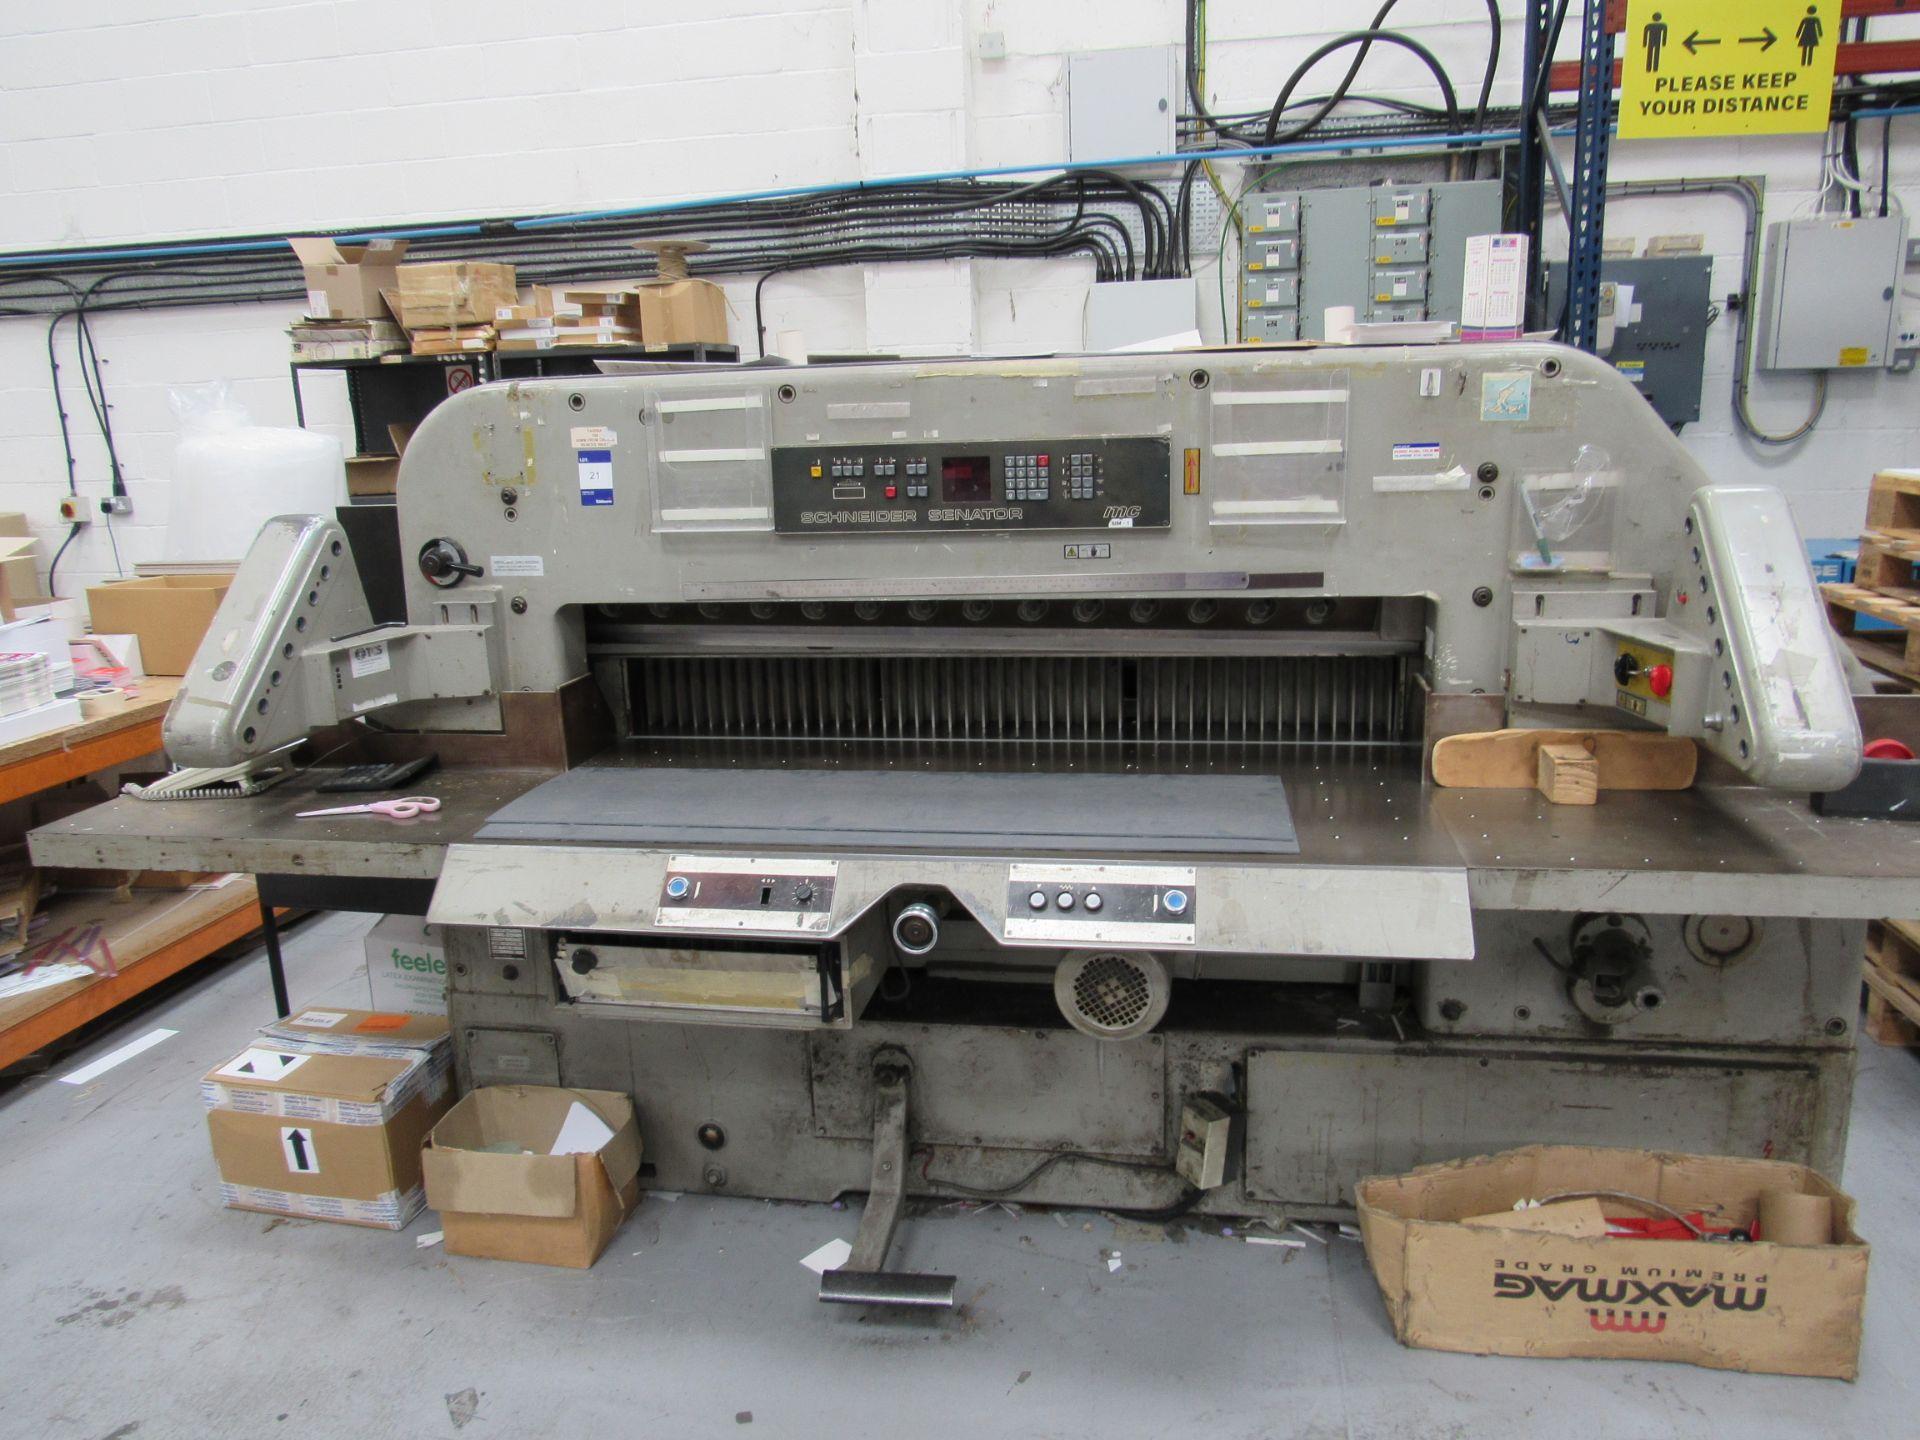 Schneider Senator MC155 guillotine 1980, Serial Number 60516 - Image 4 of 6